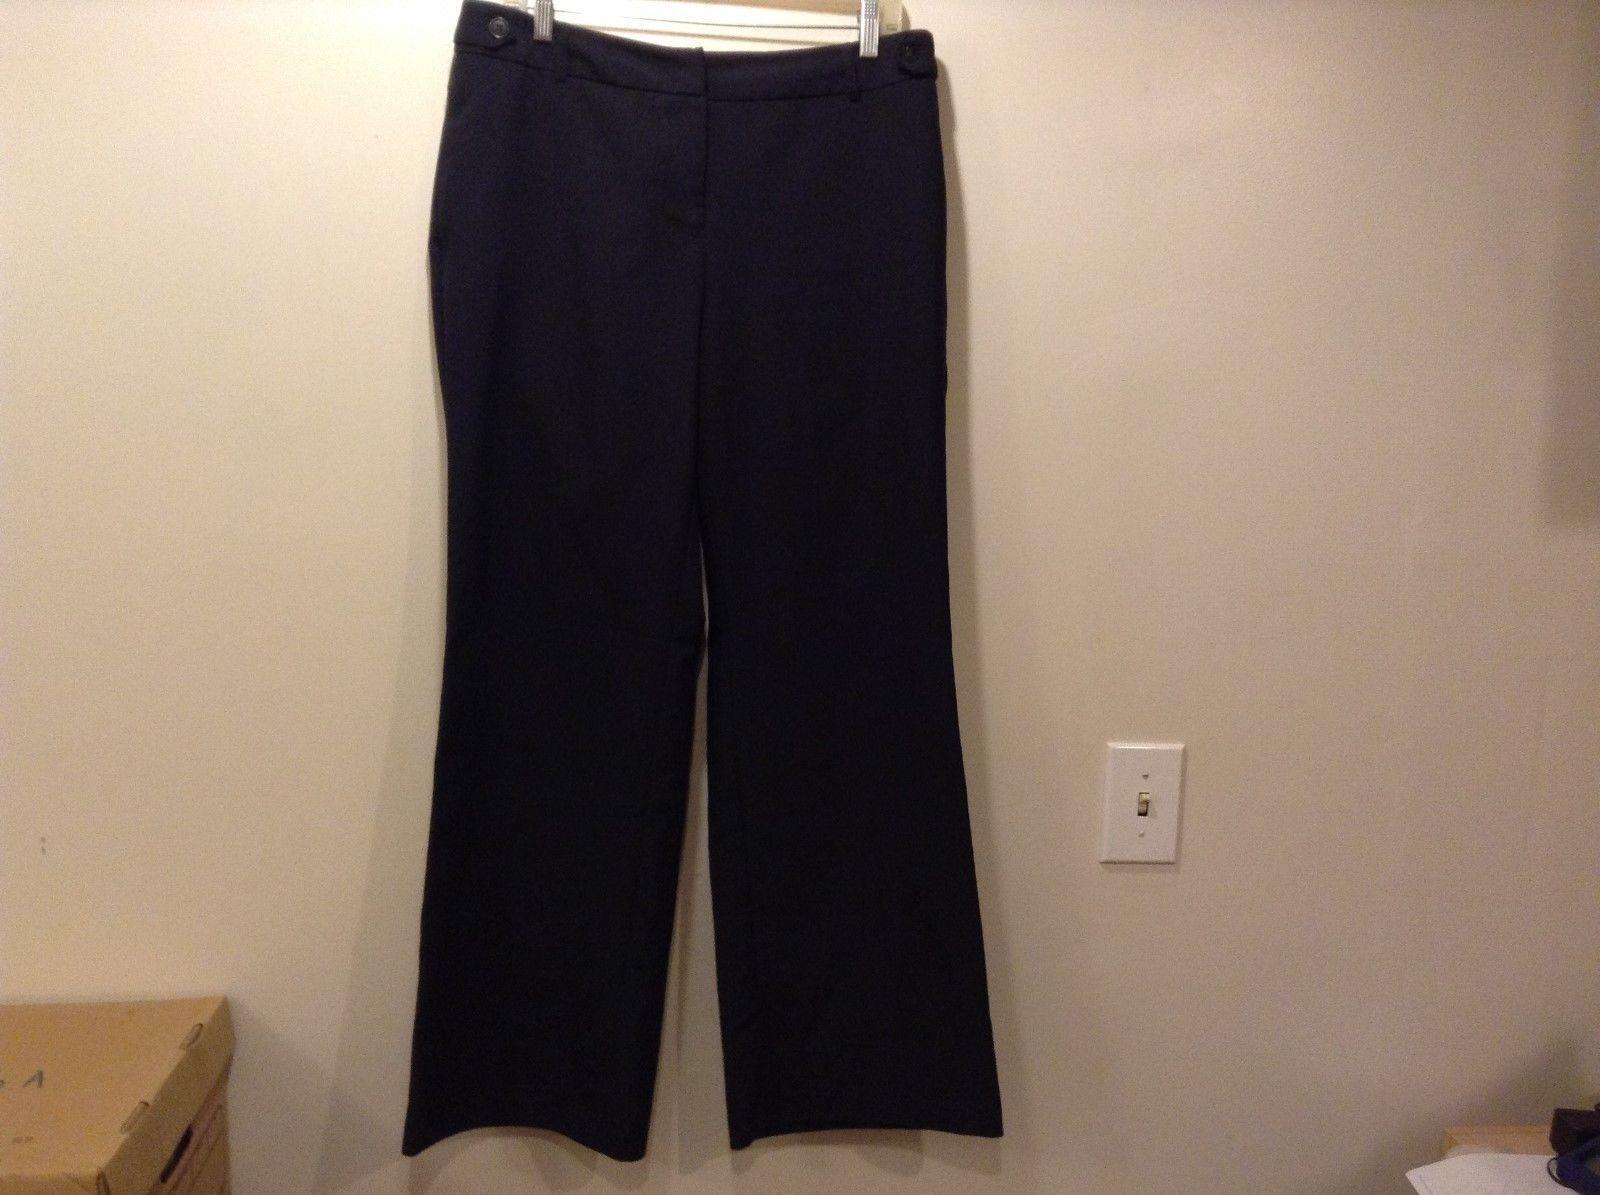 New York & Company Ladies Black Stretchy Dress Pants Sz 12